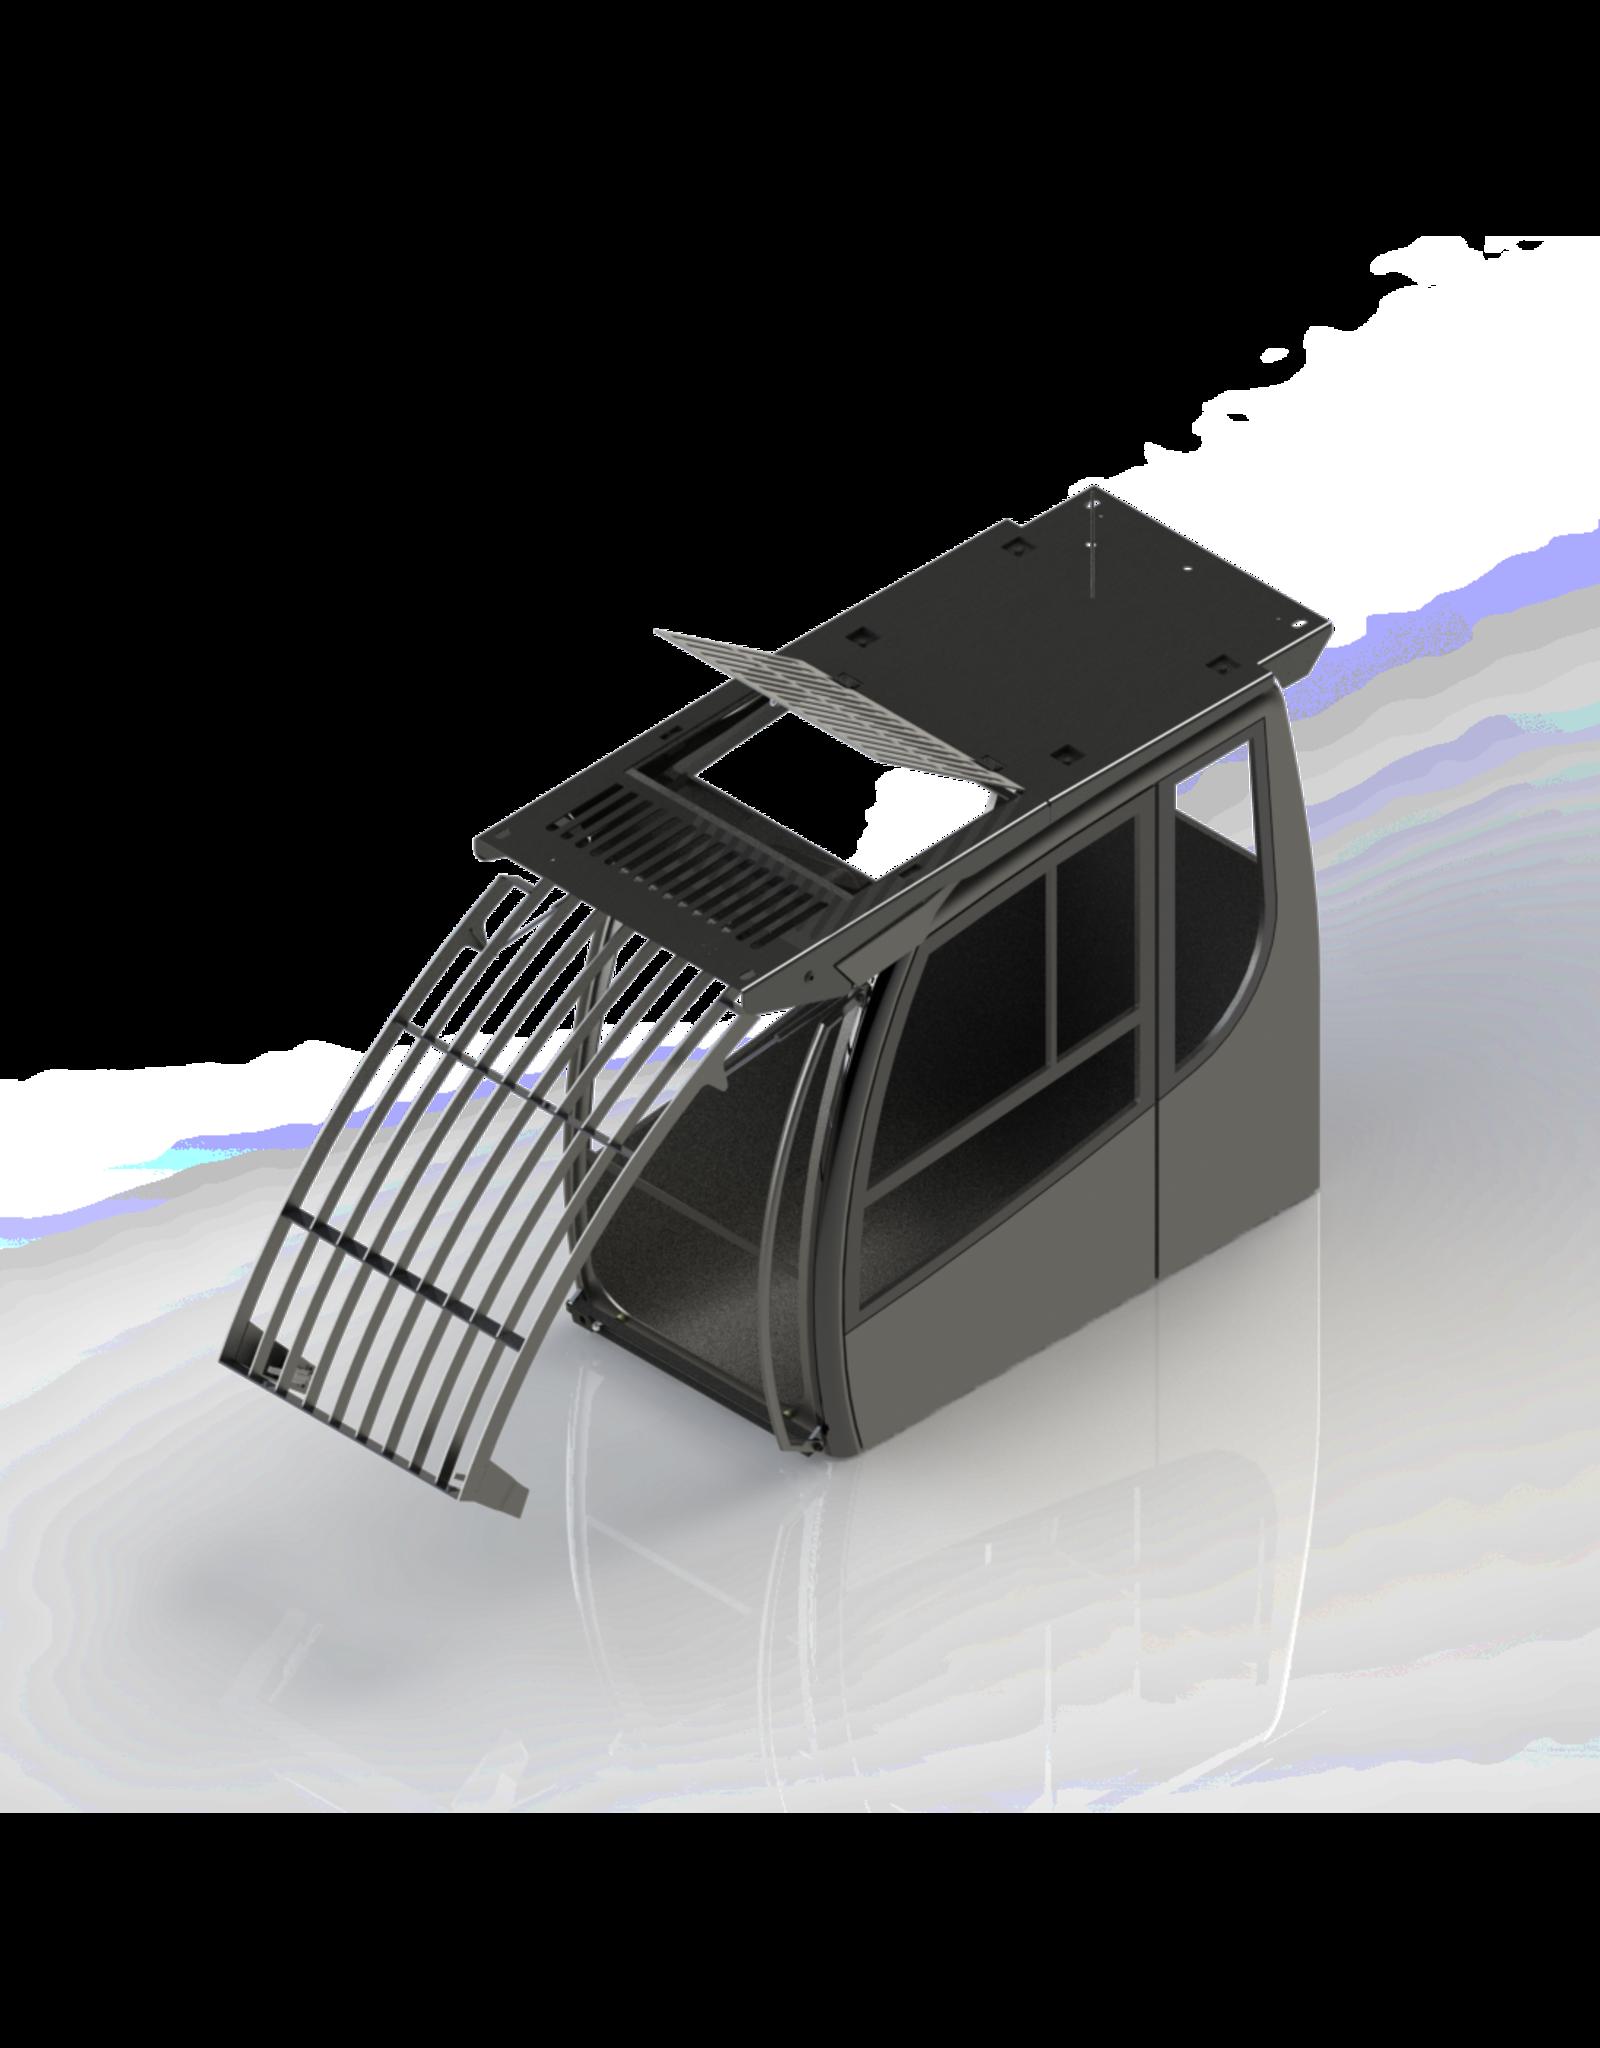 Echle Hartstahl GmbH FOPS for Komatsu PC230NHD-11